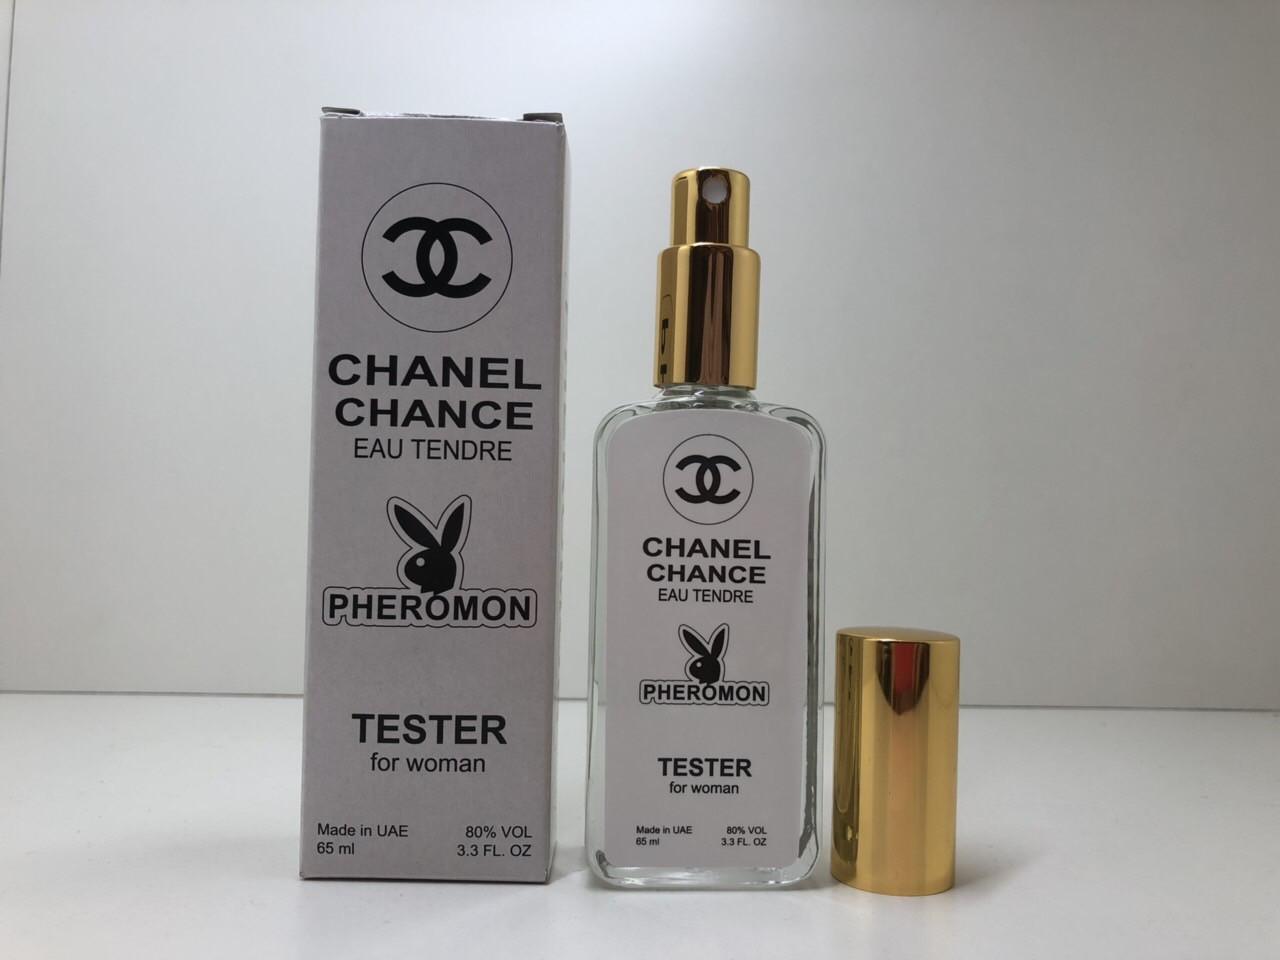 Тестер с феромонами женский Chanel Chance Eau Tendre (Шанель Шанс Тендер) 65 мл